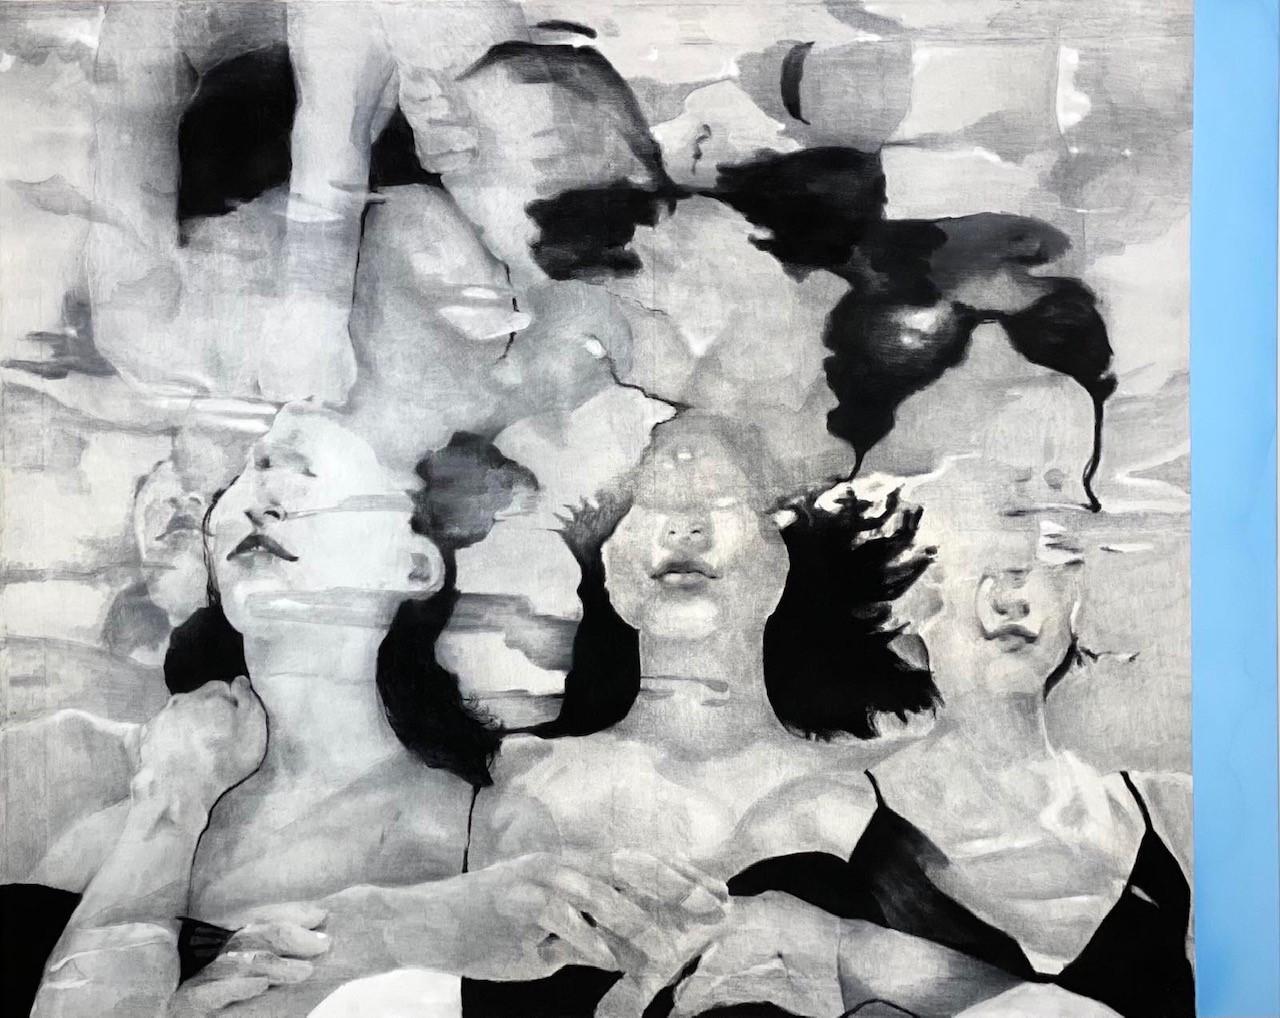 THE O GALLERY: Έκθεση του εικαστικού Σπύρου Προκοπίου στη Λάρνακα